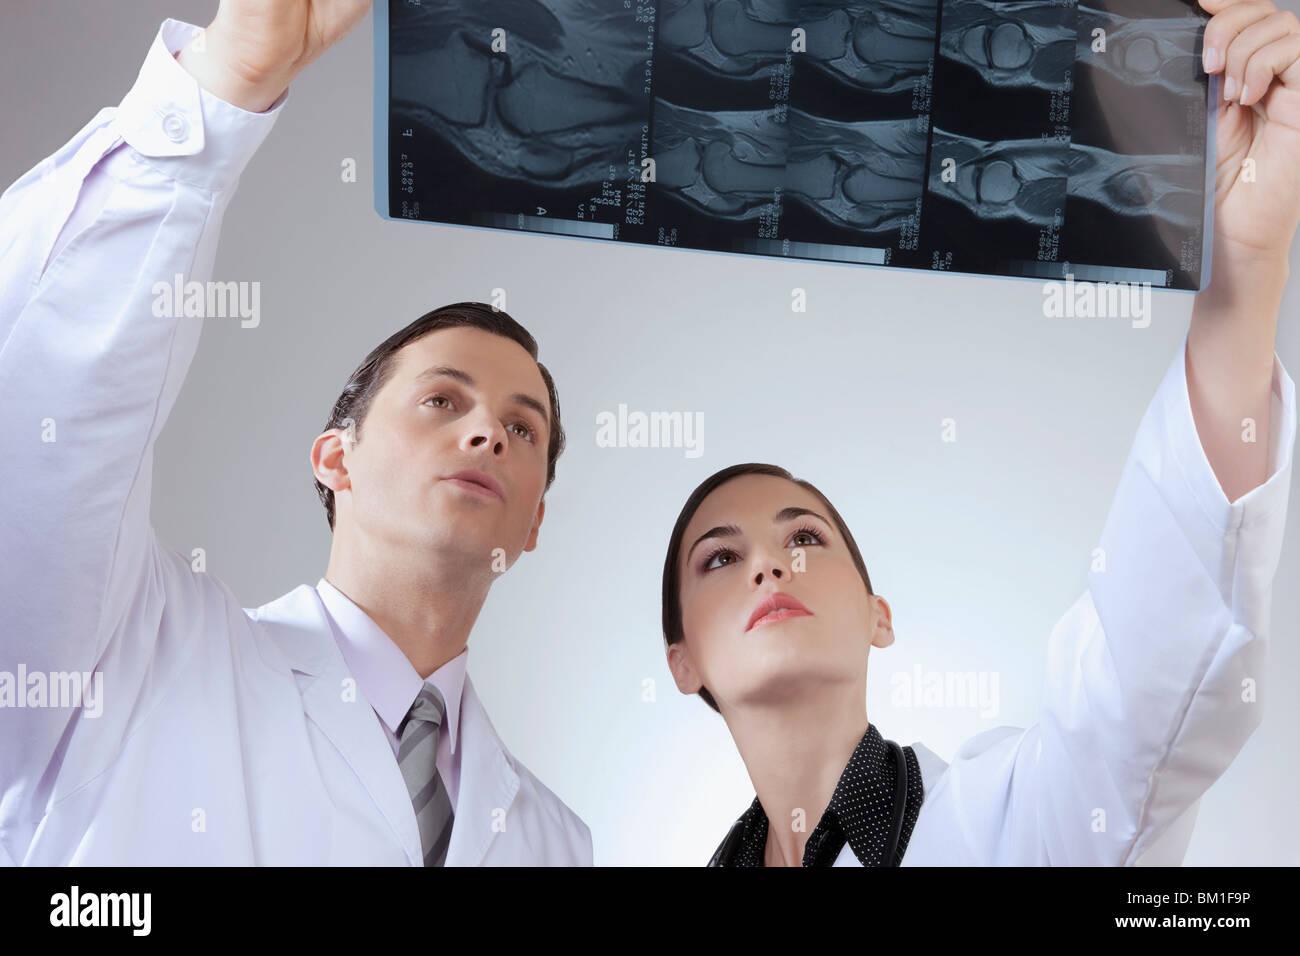 X Hand Stockfotos & X Hand Bilder - Alamy